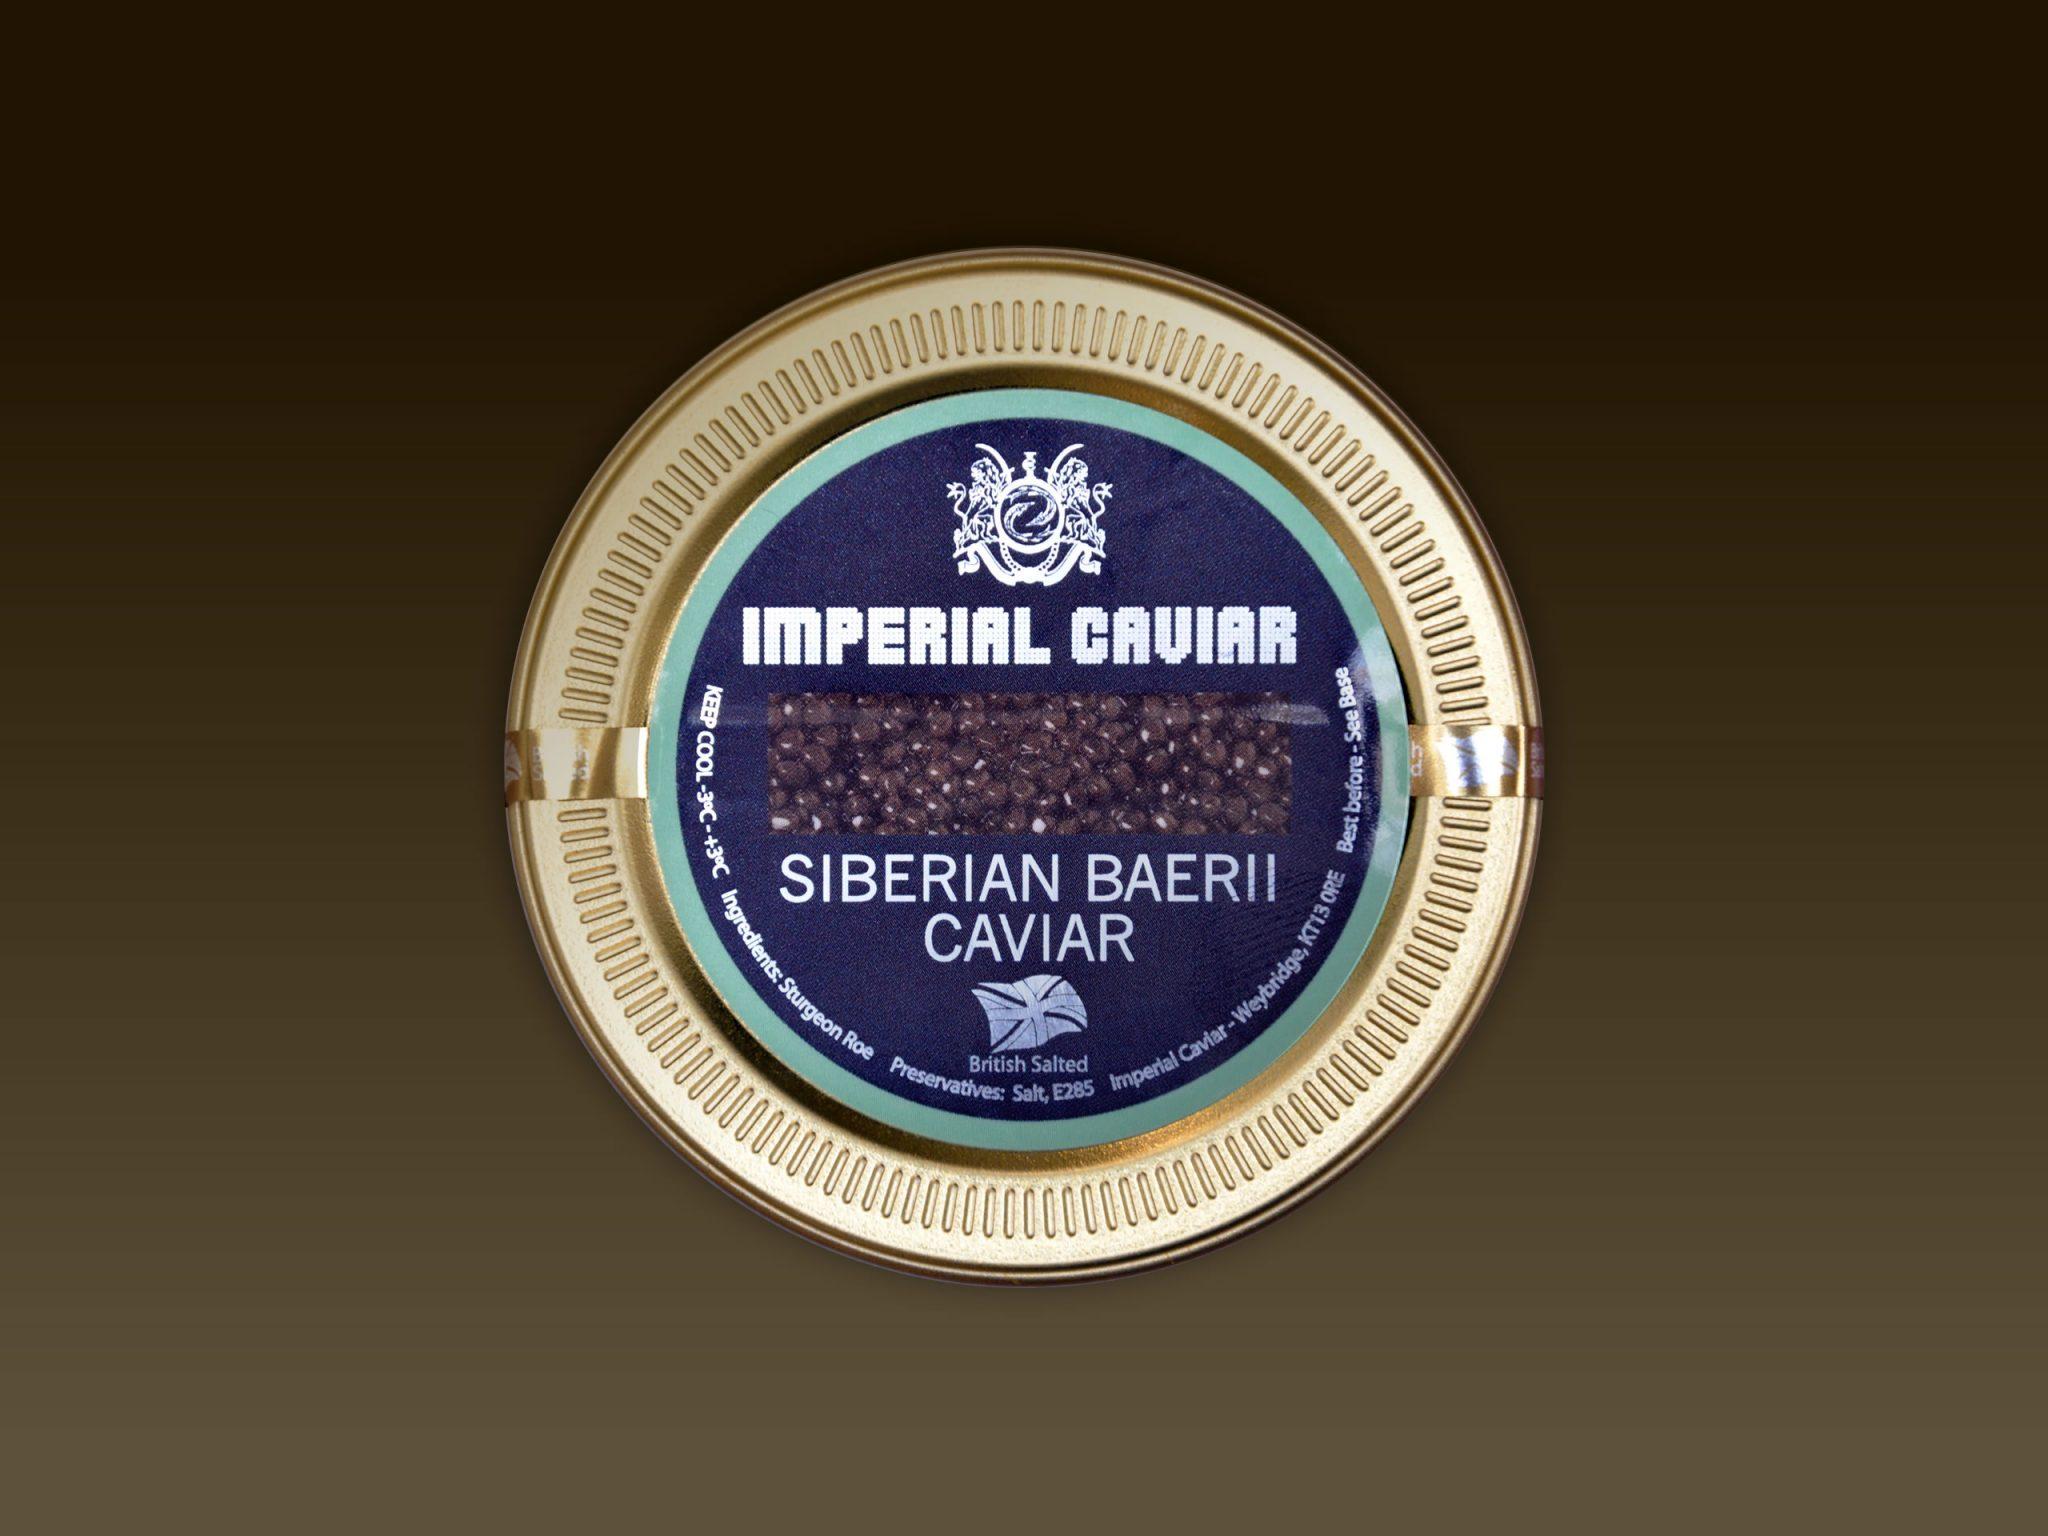 Siberian Baerii Caviar